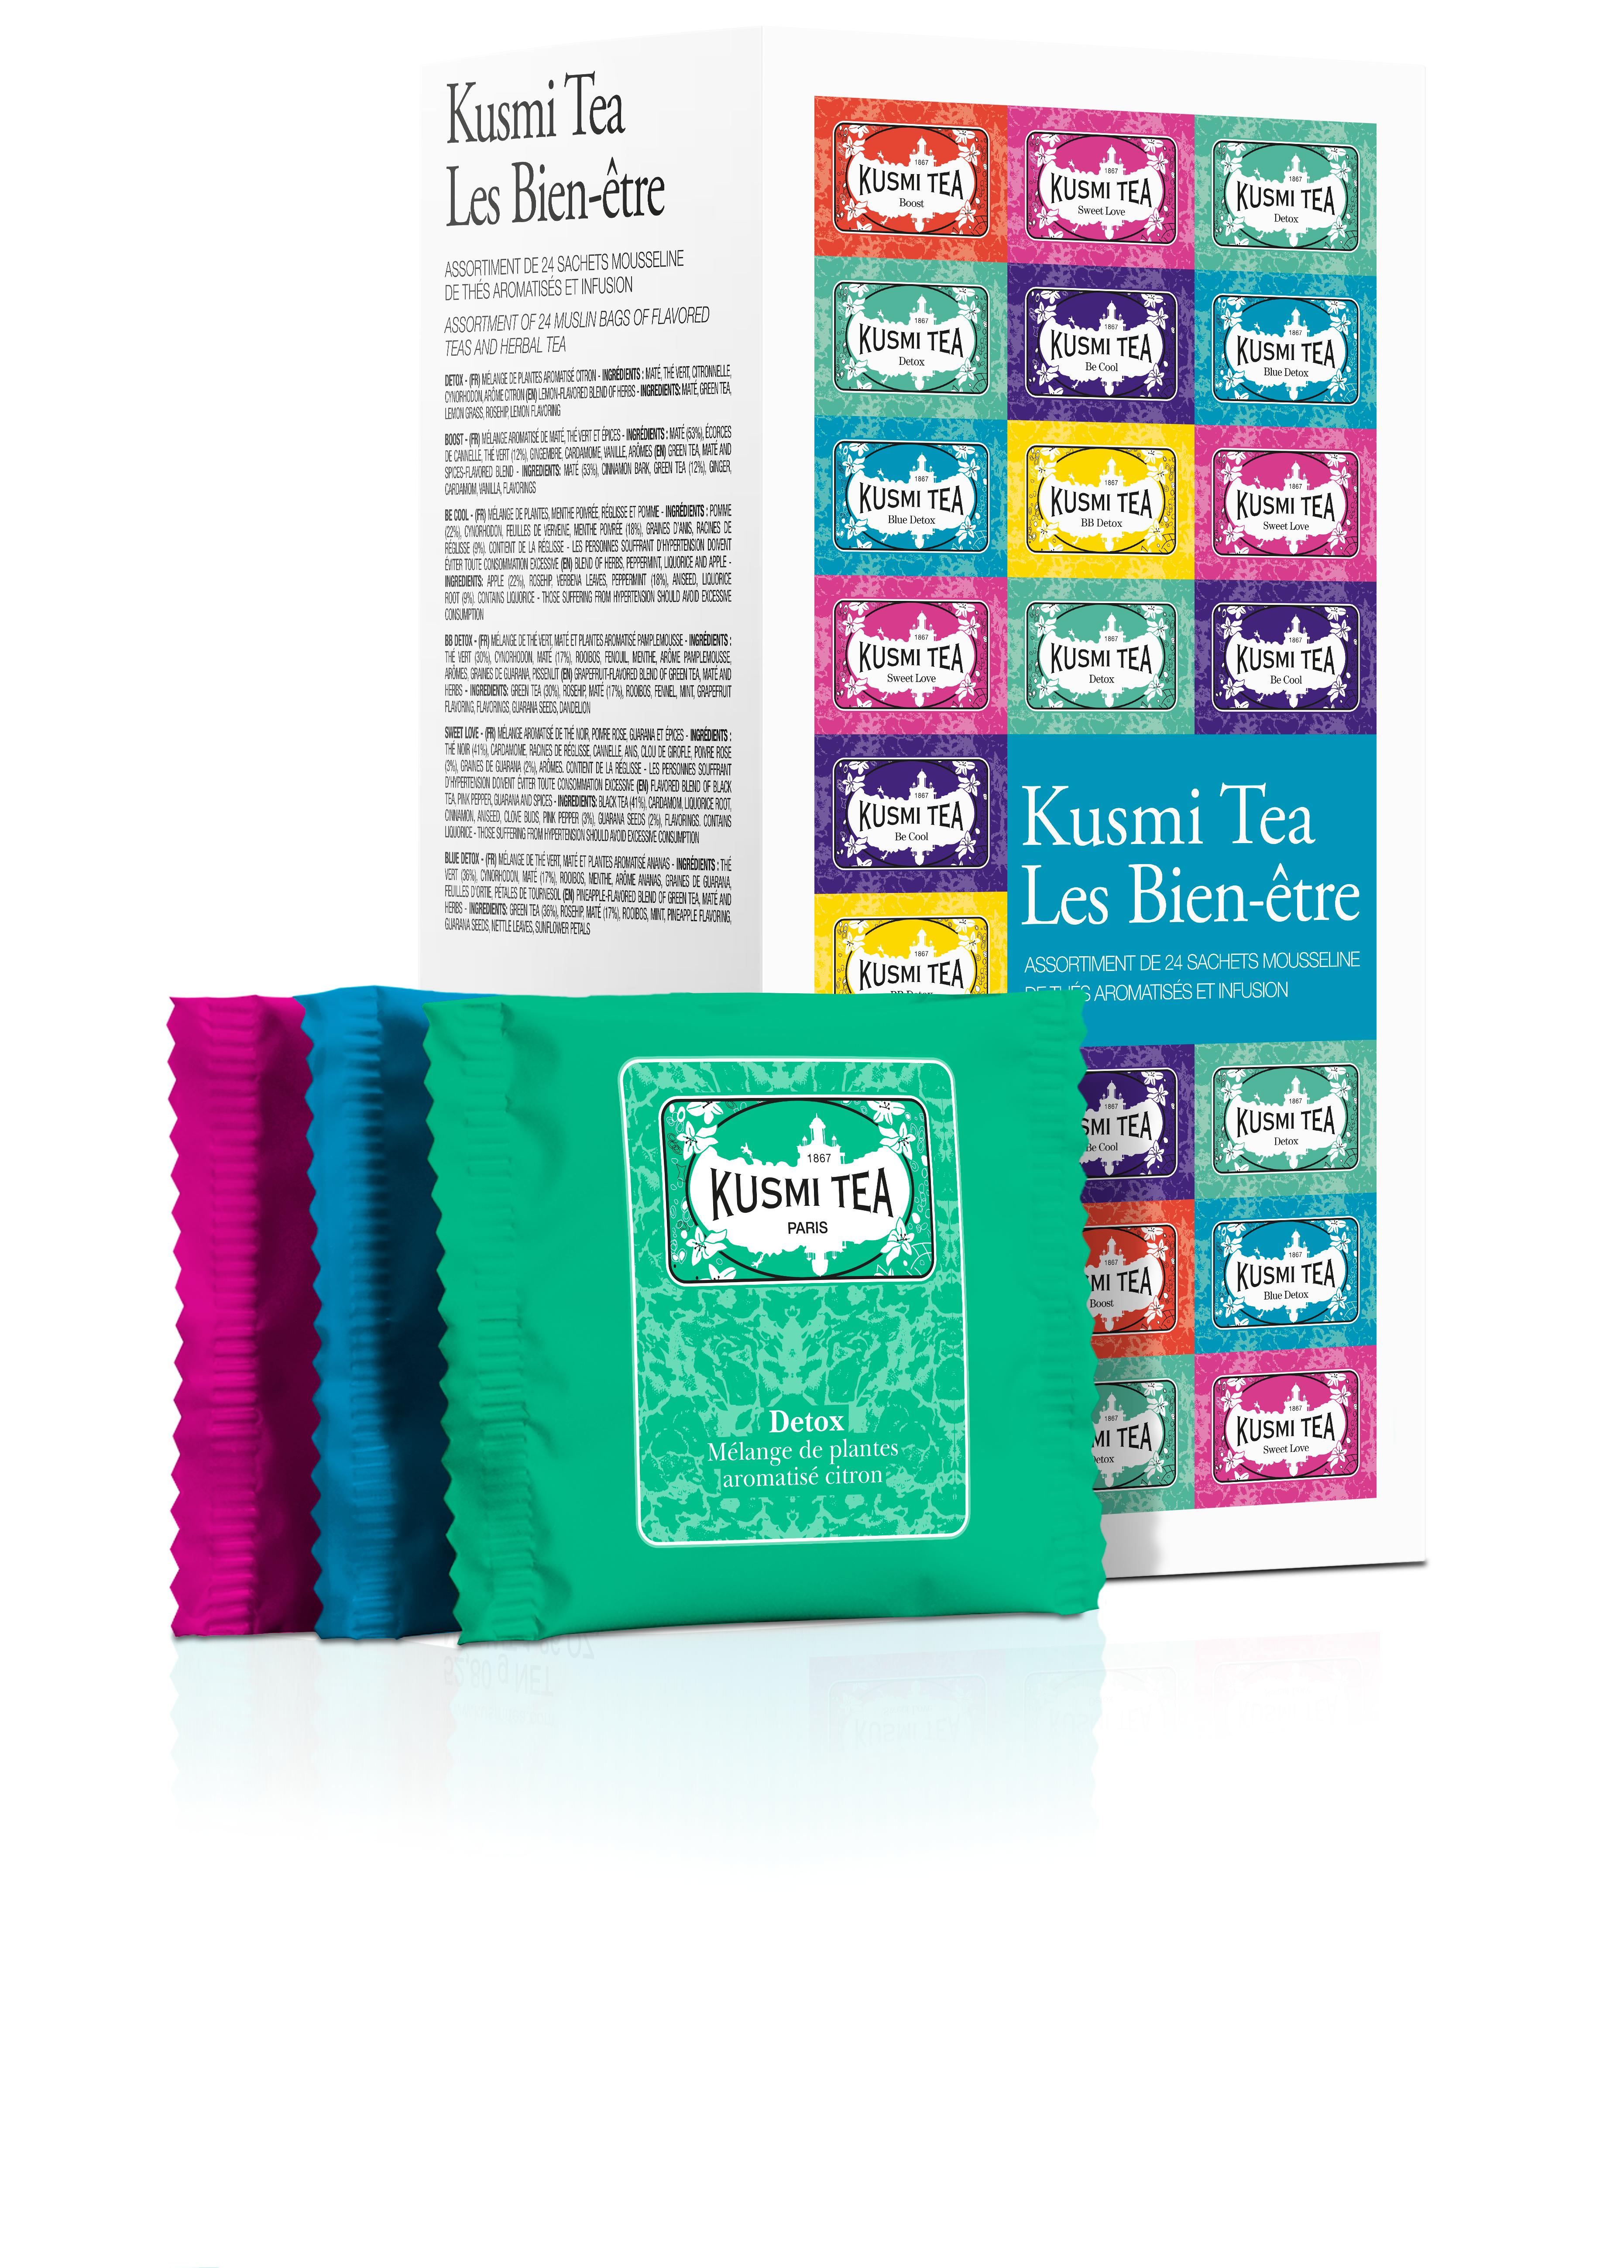 KUSMI TEA Coffret de thé en sachet Les Bien-être Thé vert  Kusmi Tea